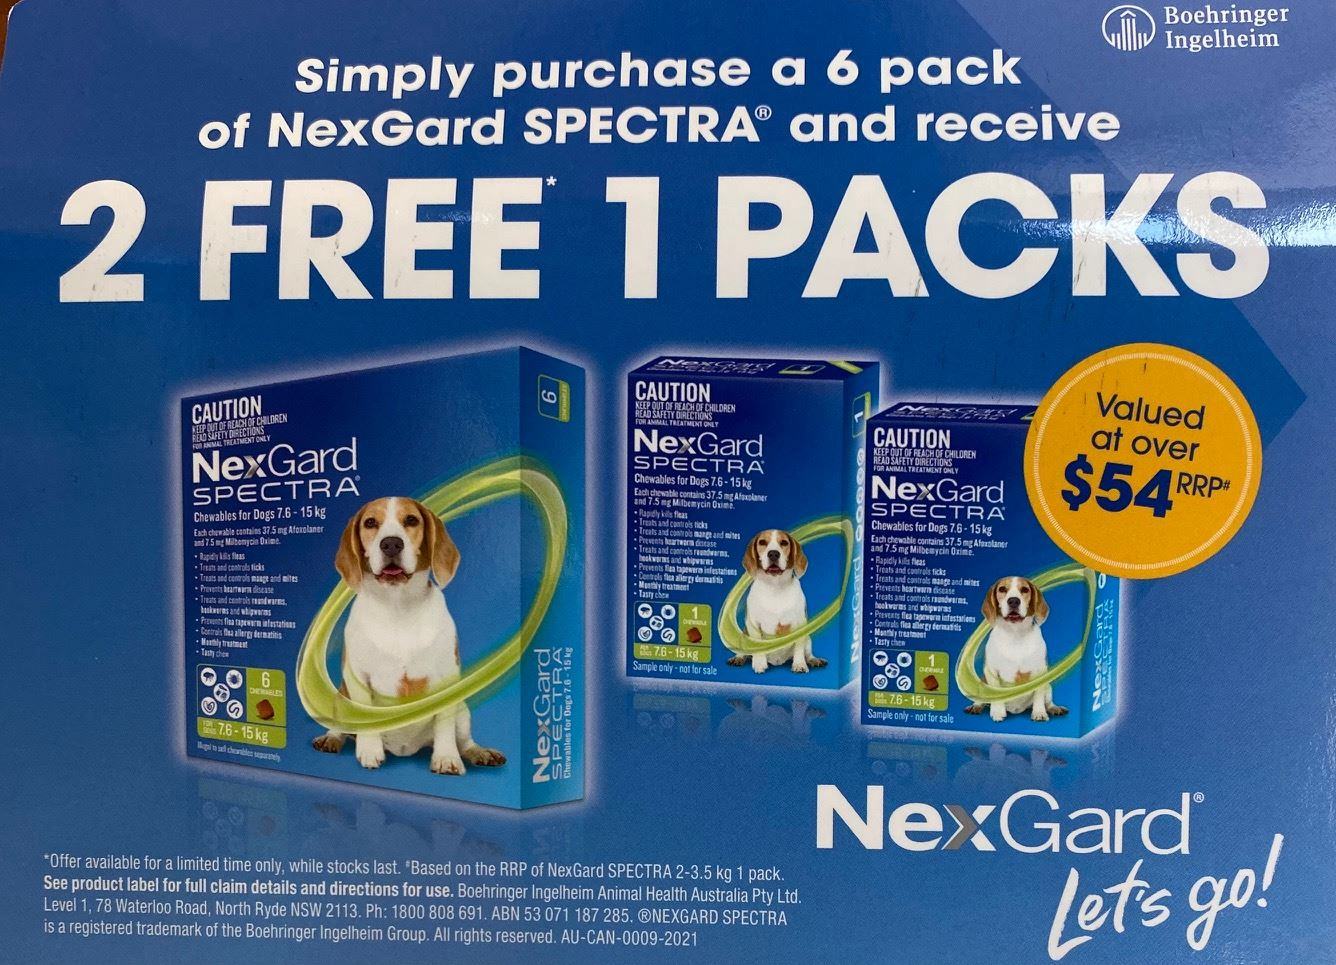 NexGard Spectra, dog, fleas, mites, ticks, protection, 2 for 1 offer